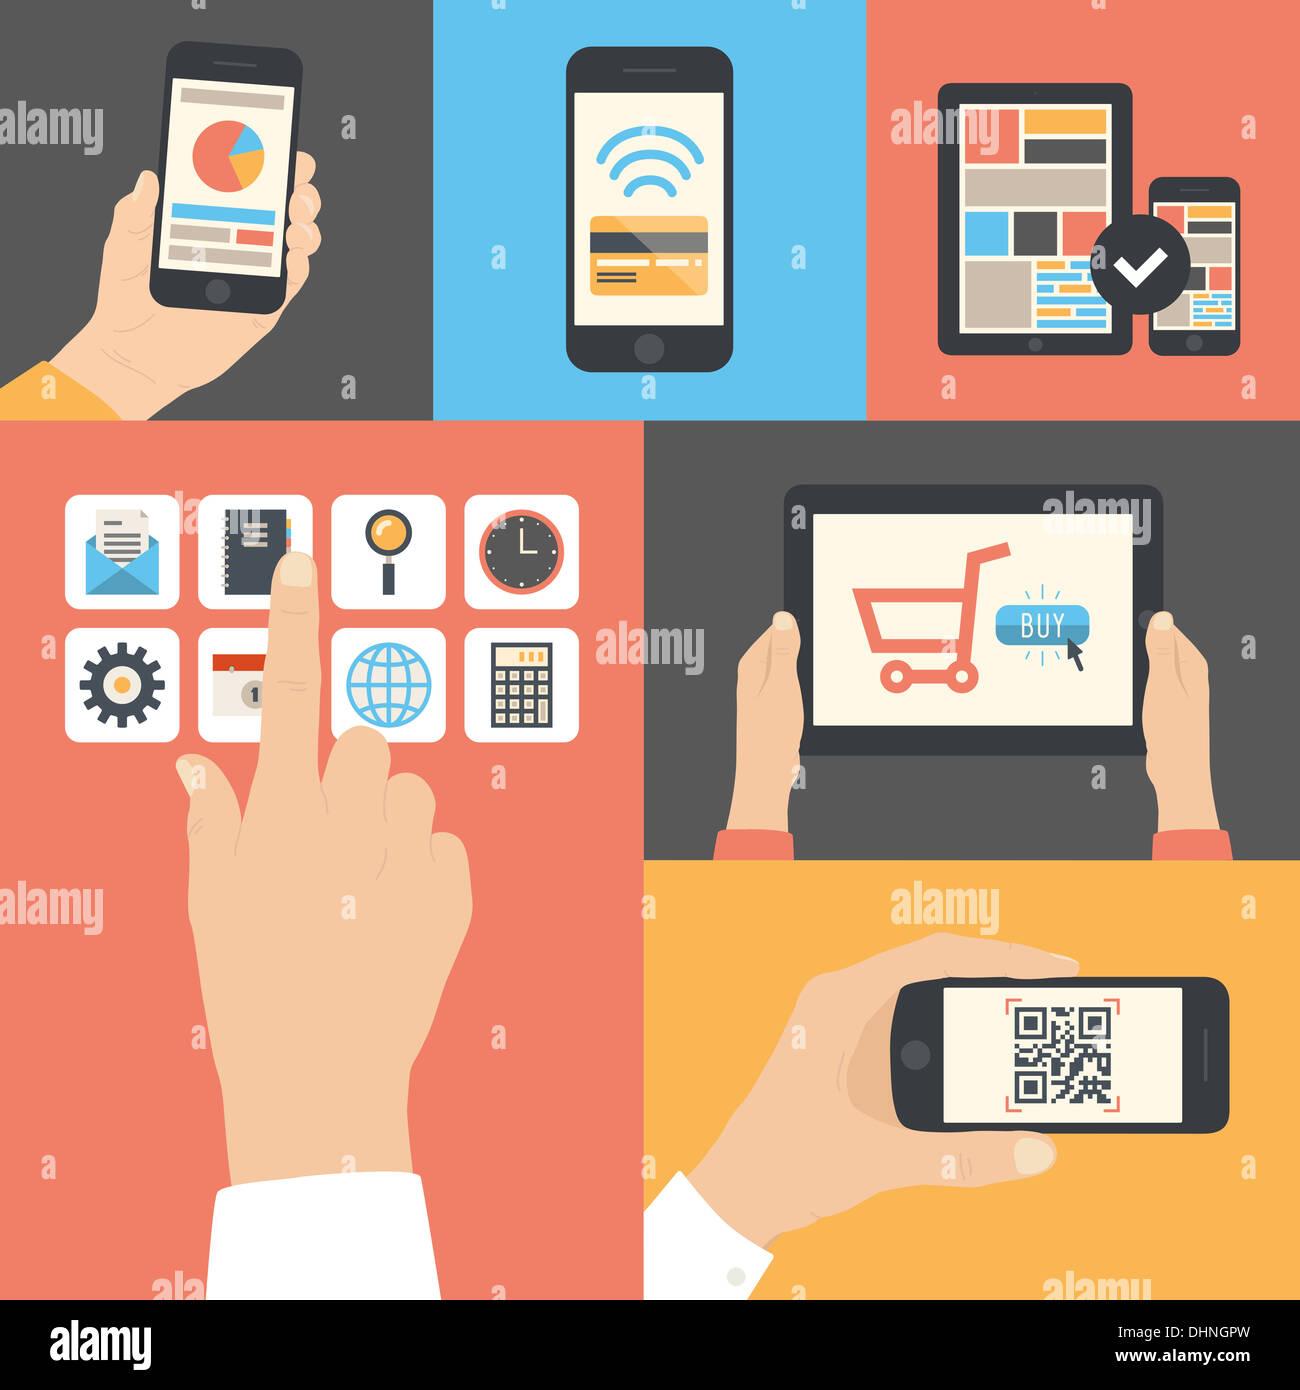 Ilustración plana conjunto de interfaz de pantalla táctil, teléfono móvil escanear QR-code, compra on-line y uso de e-commerce Imagen De Stock